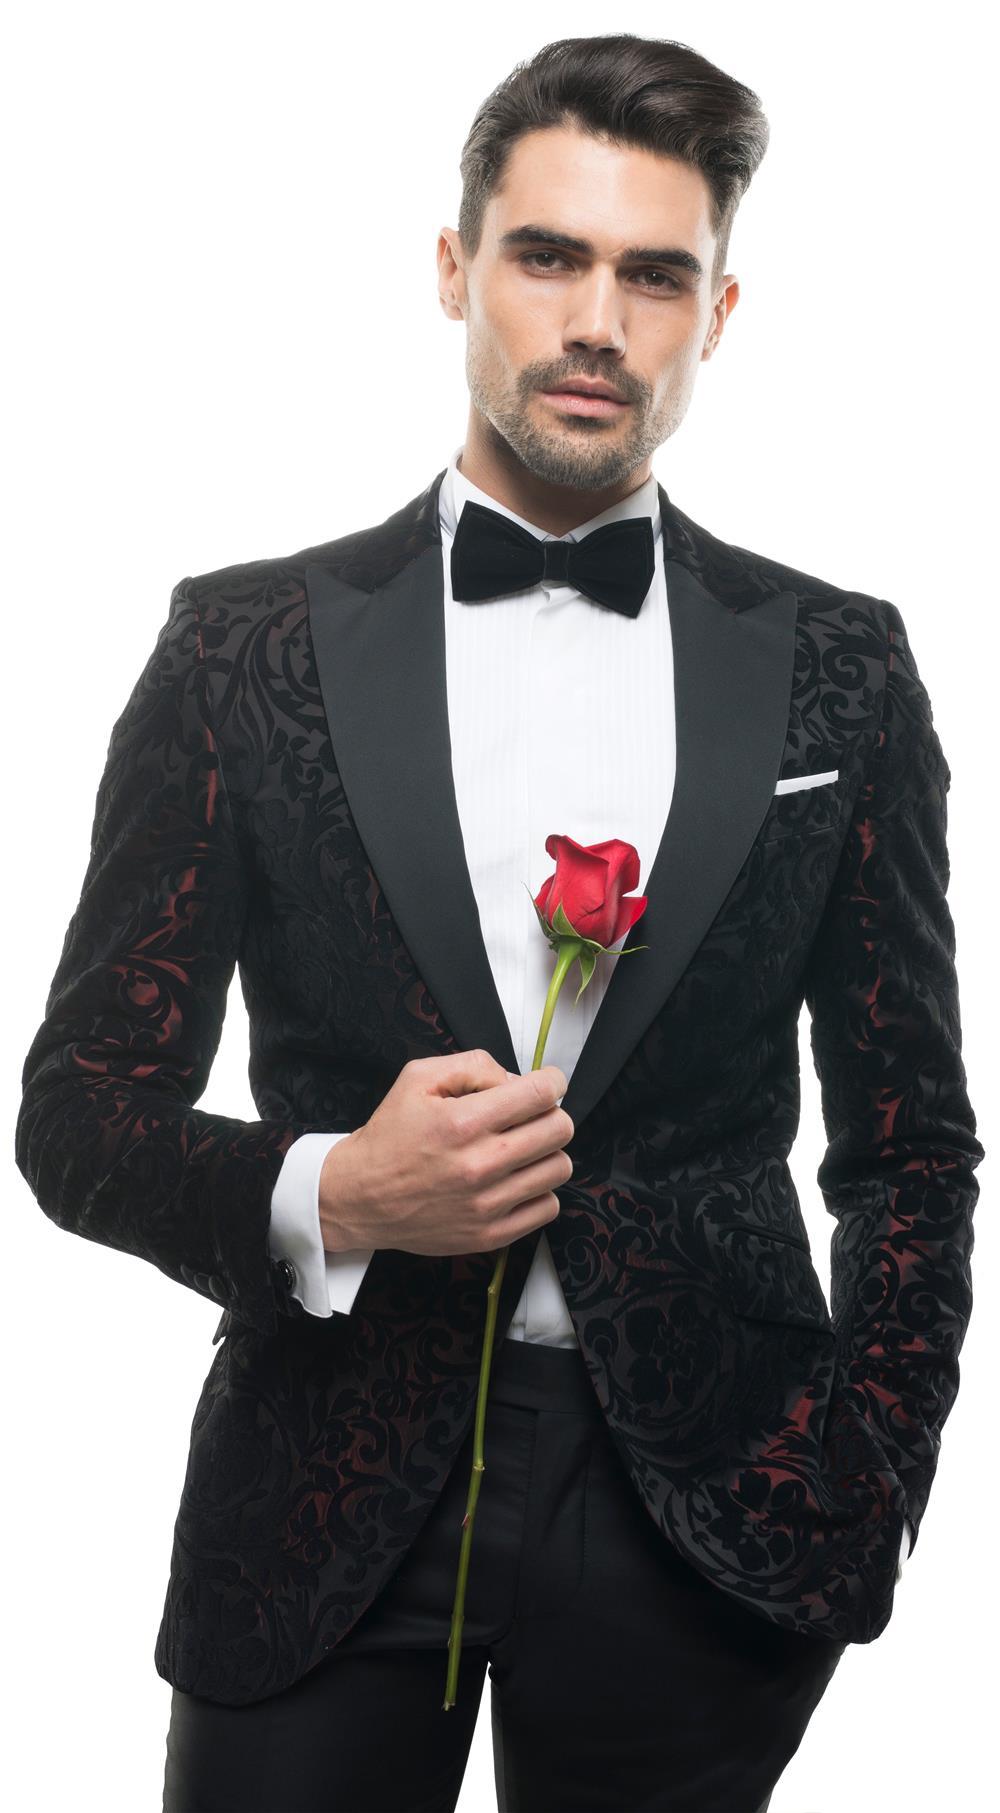 Costume barbati la comanda super elegante 1700 lei in maxim 2 saptamani